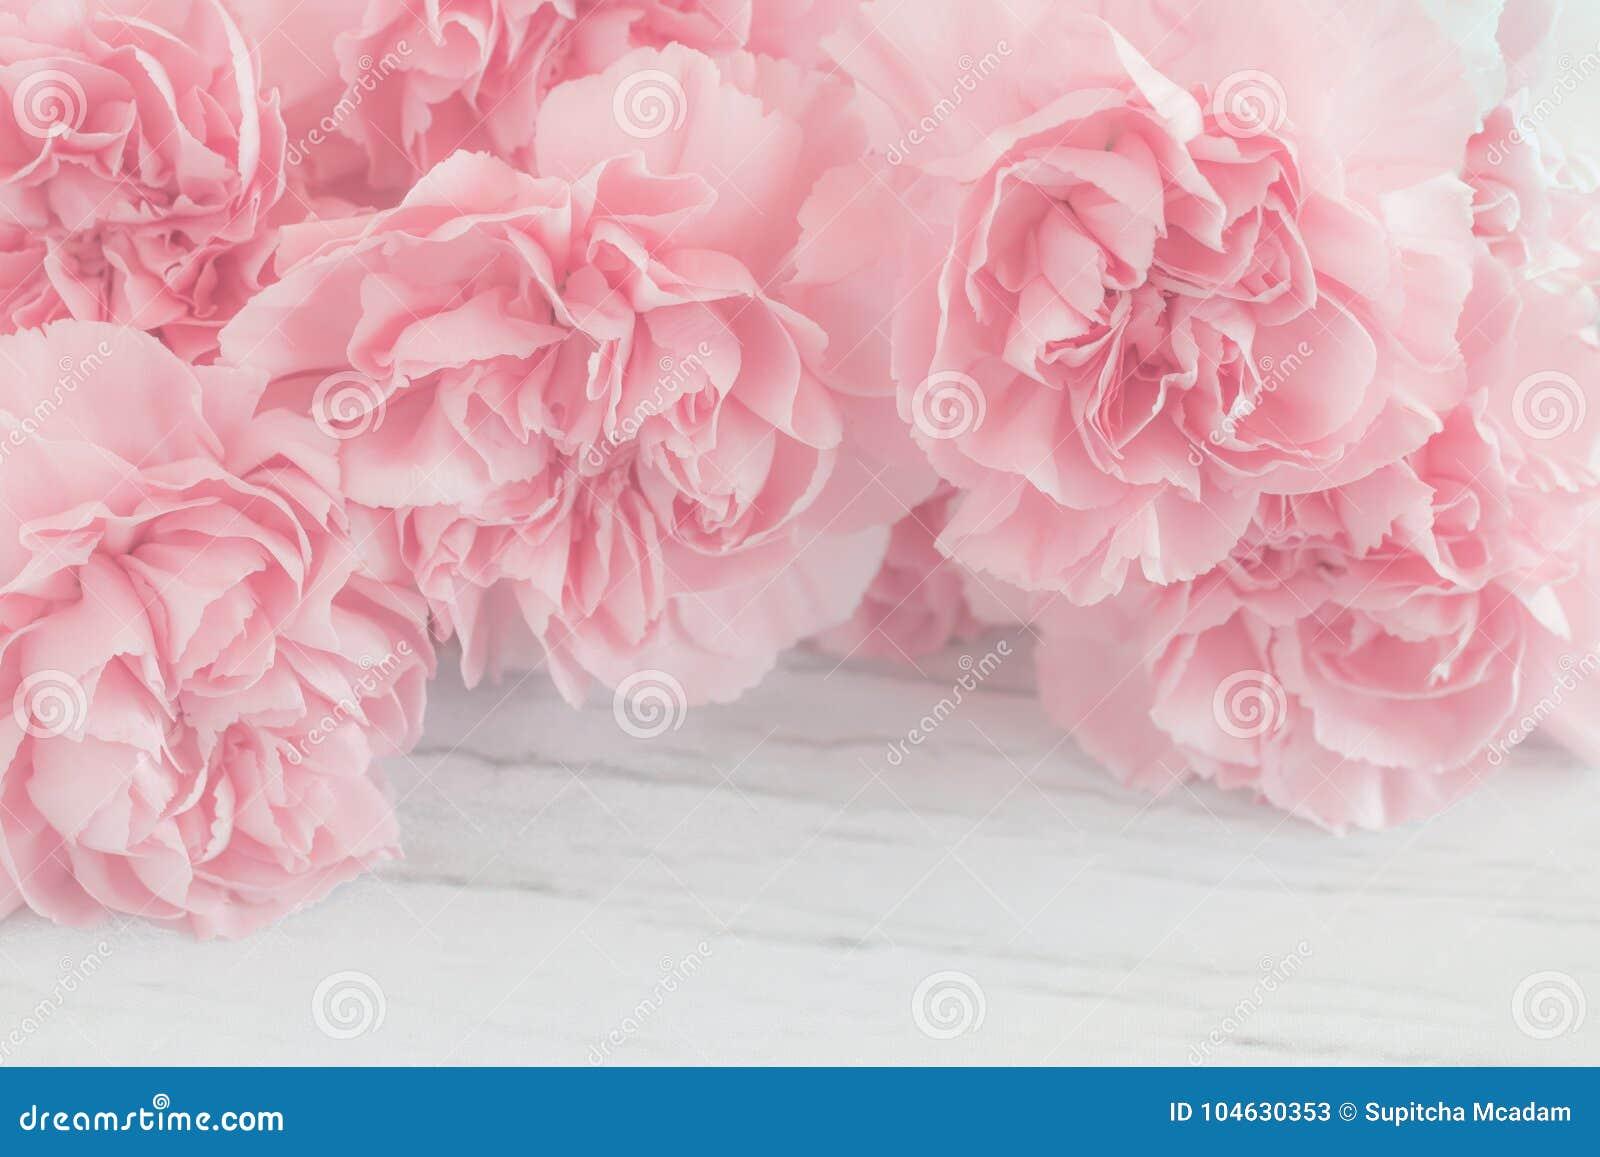 Pink Carnation Flowers Bouquet Stock Image Image Of Feminine